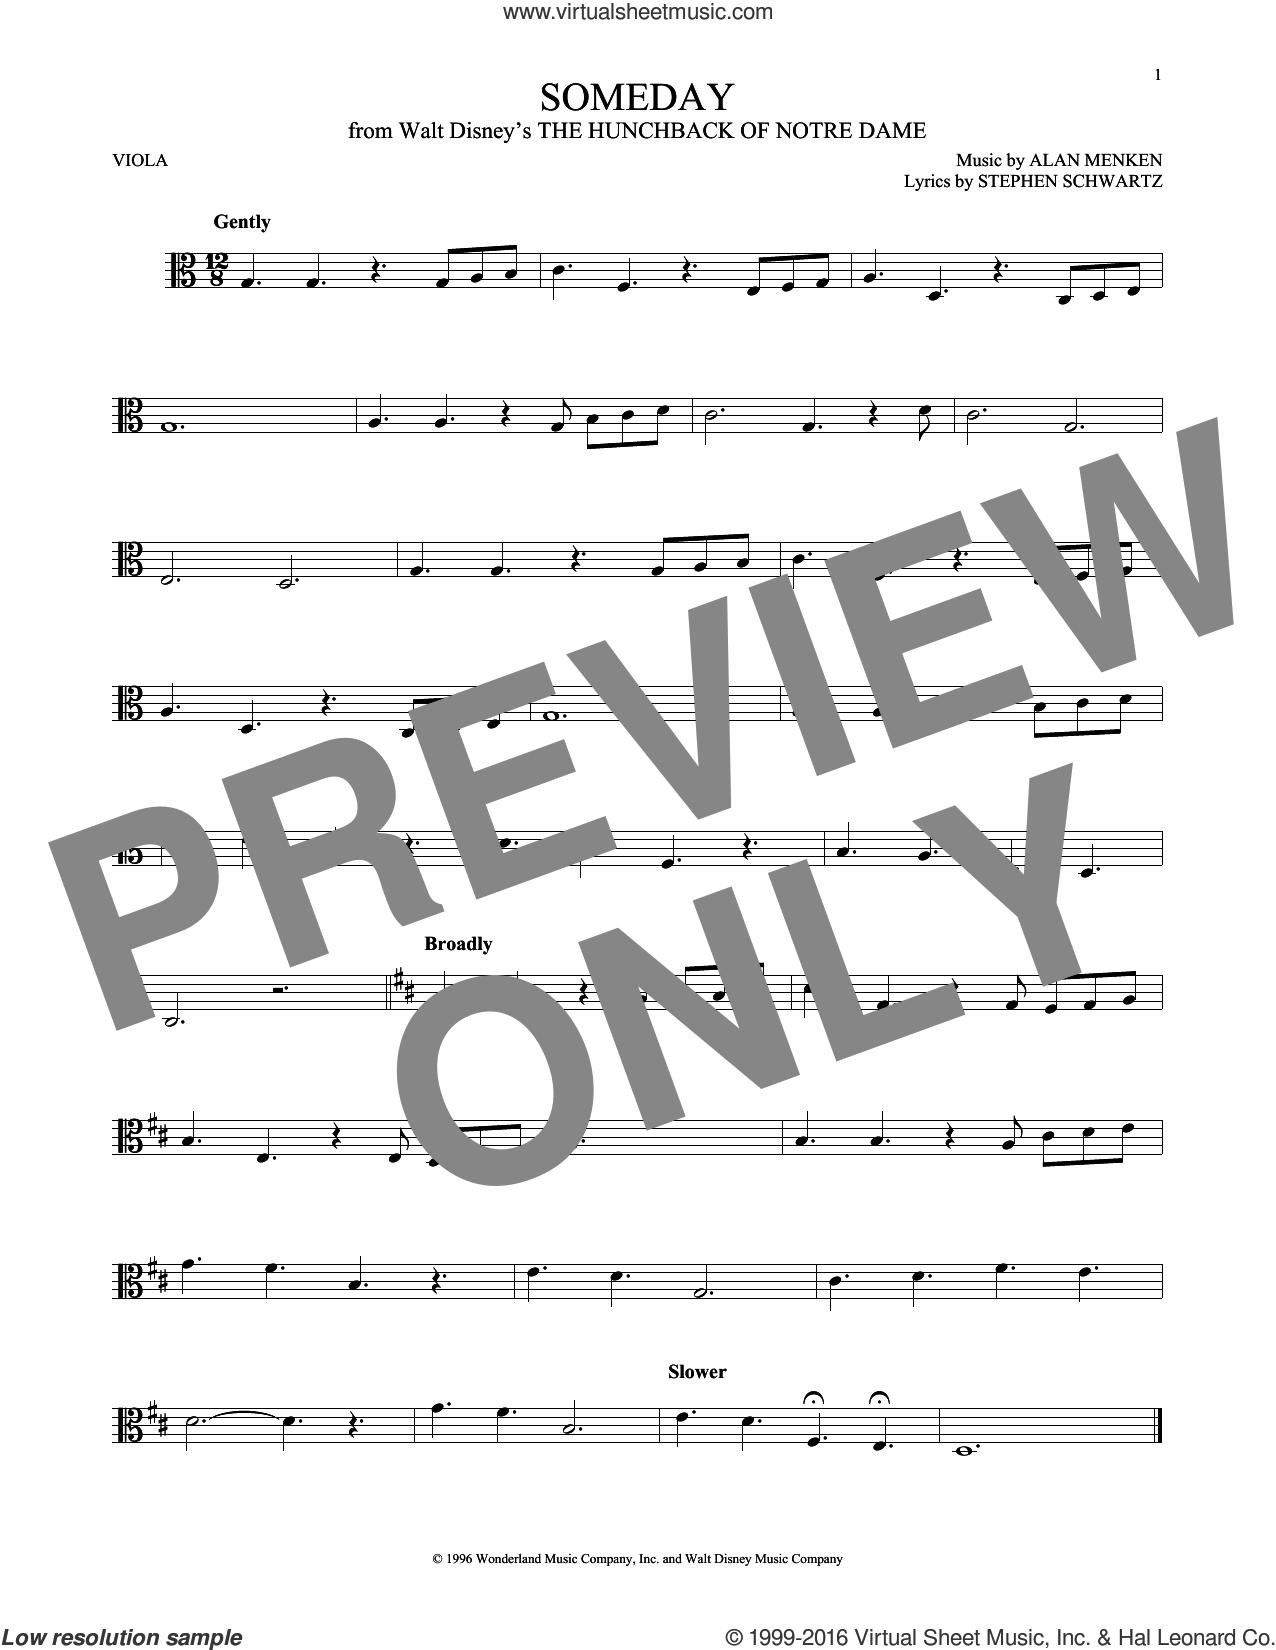 Someday (Esmeralda's Prayer) sheet music for viola solo by Alan Menken, Donna Summer and Stephen Schwartz, intermediate skill level